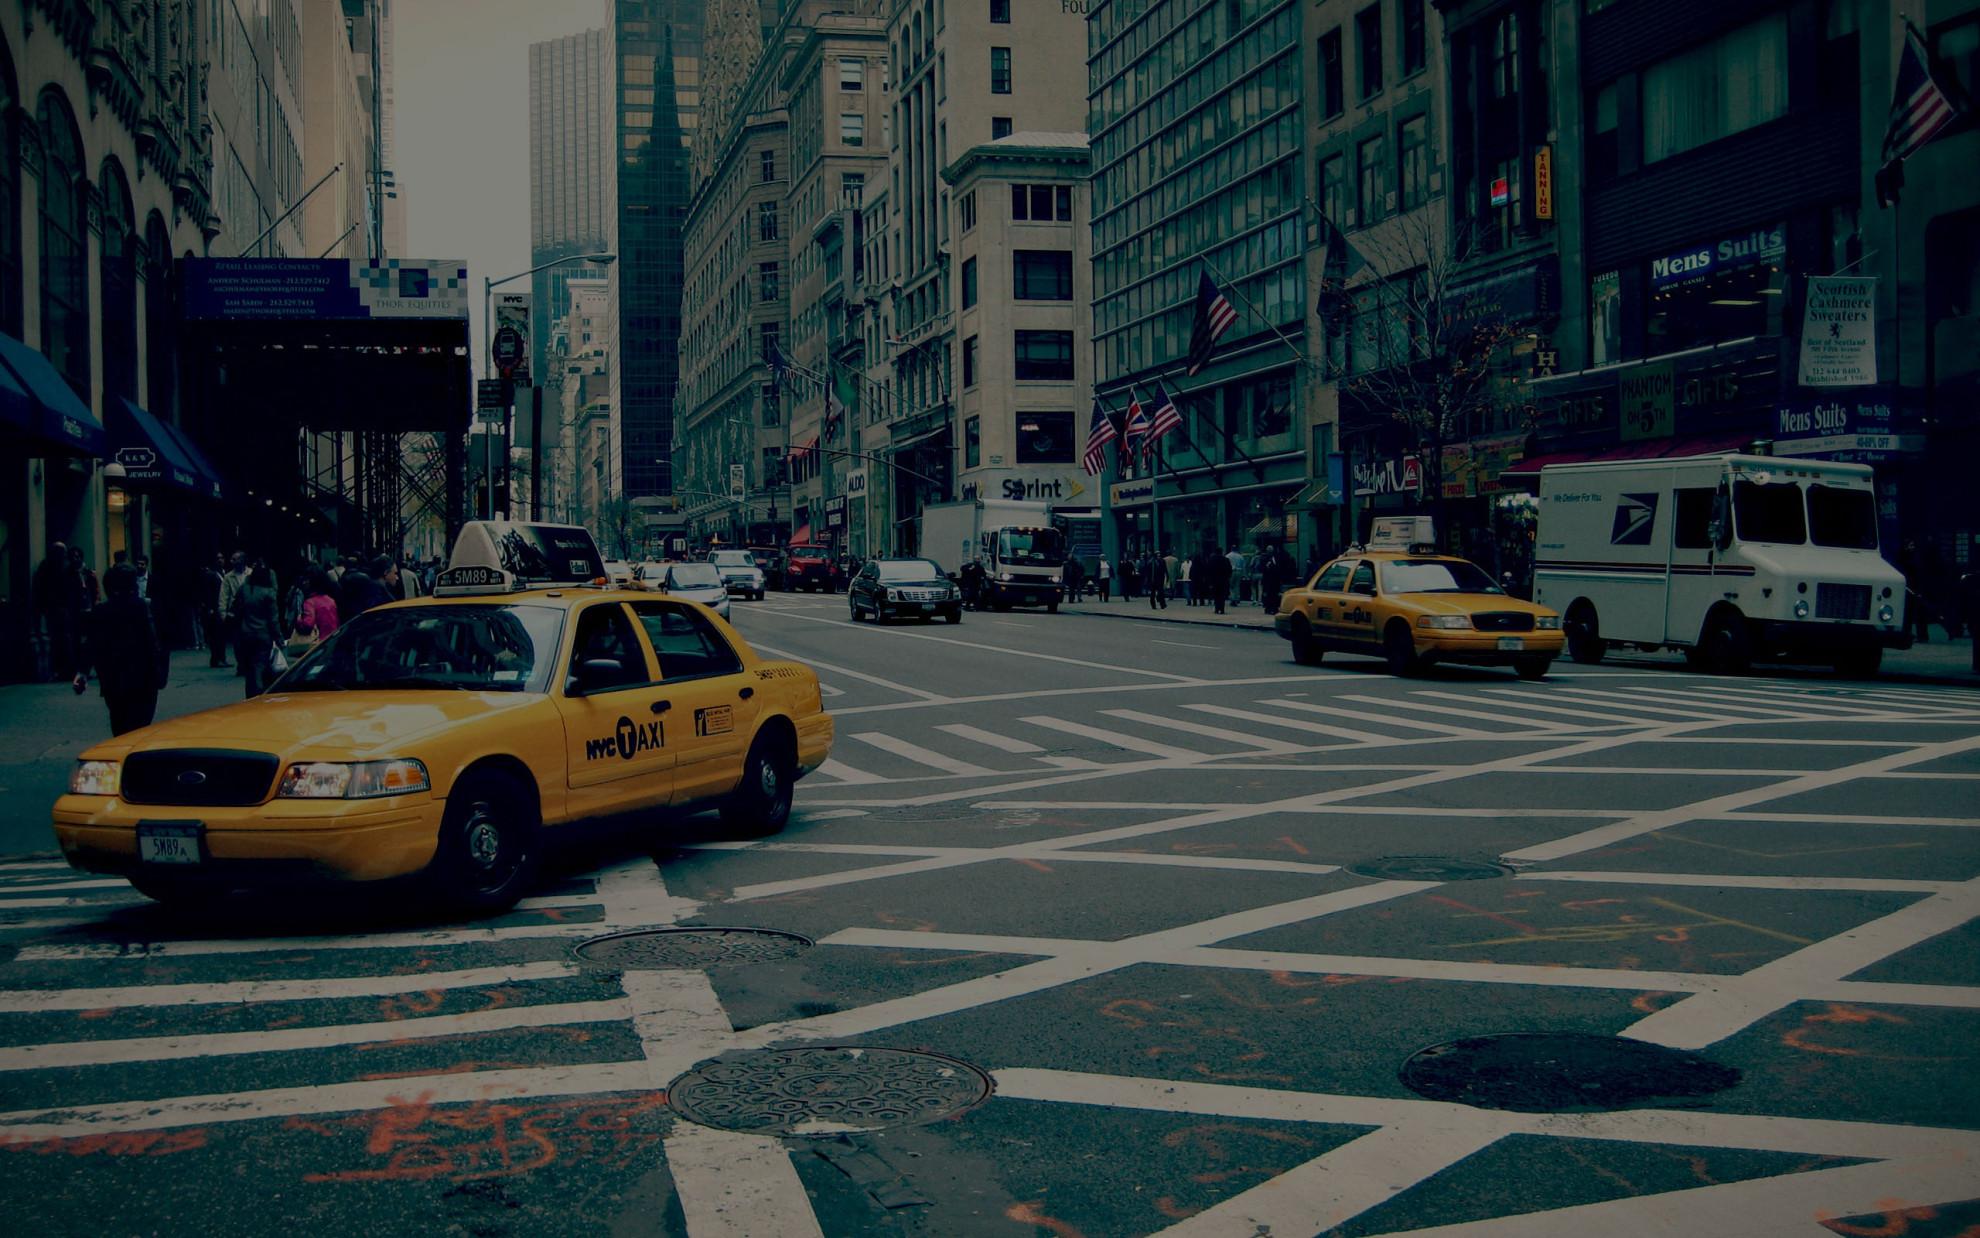 new-york-city-street-wallpaper copy